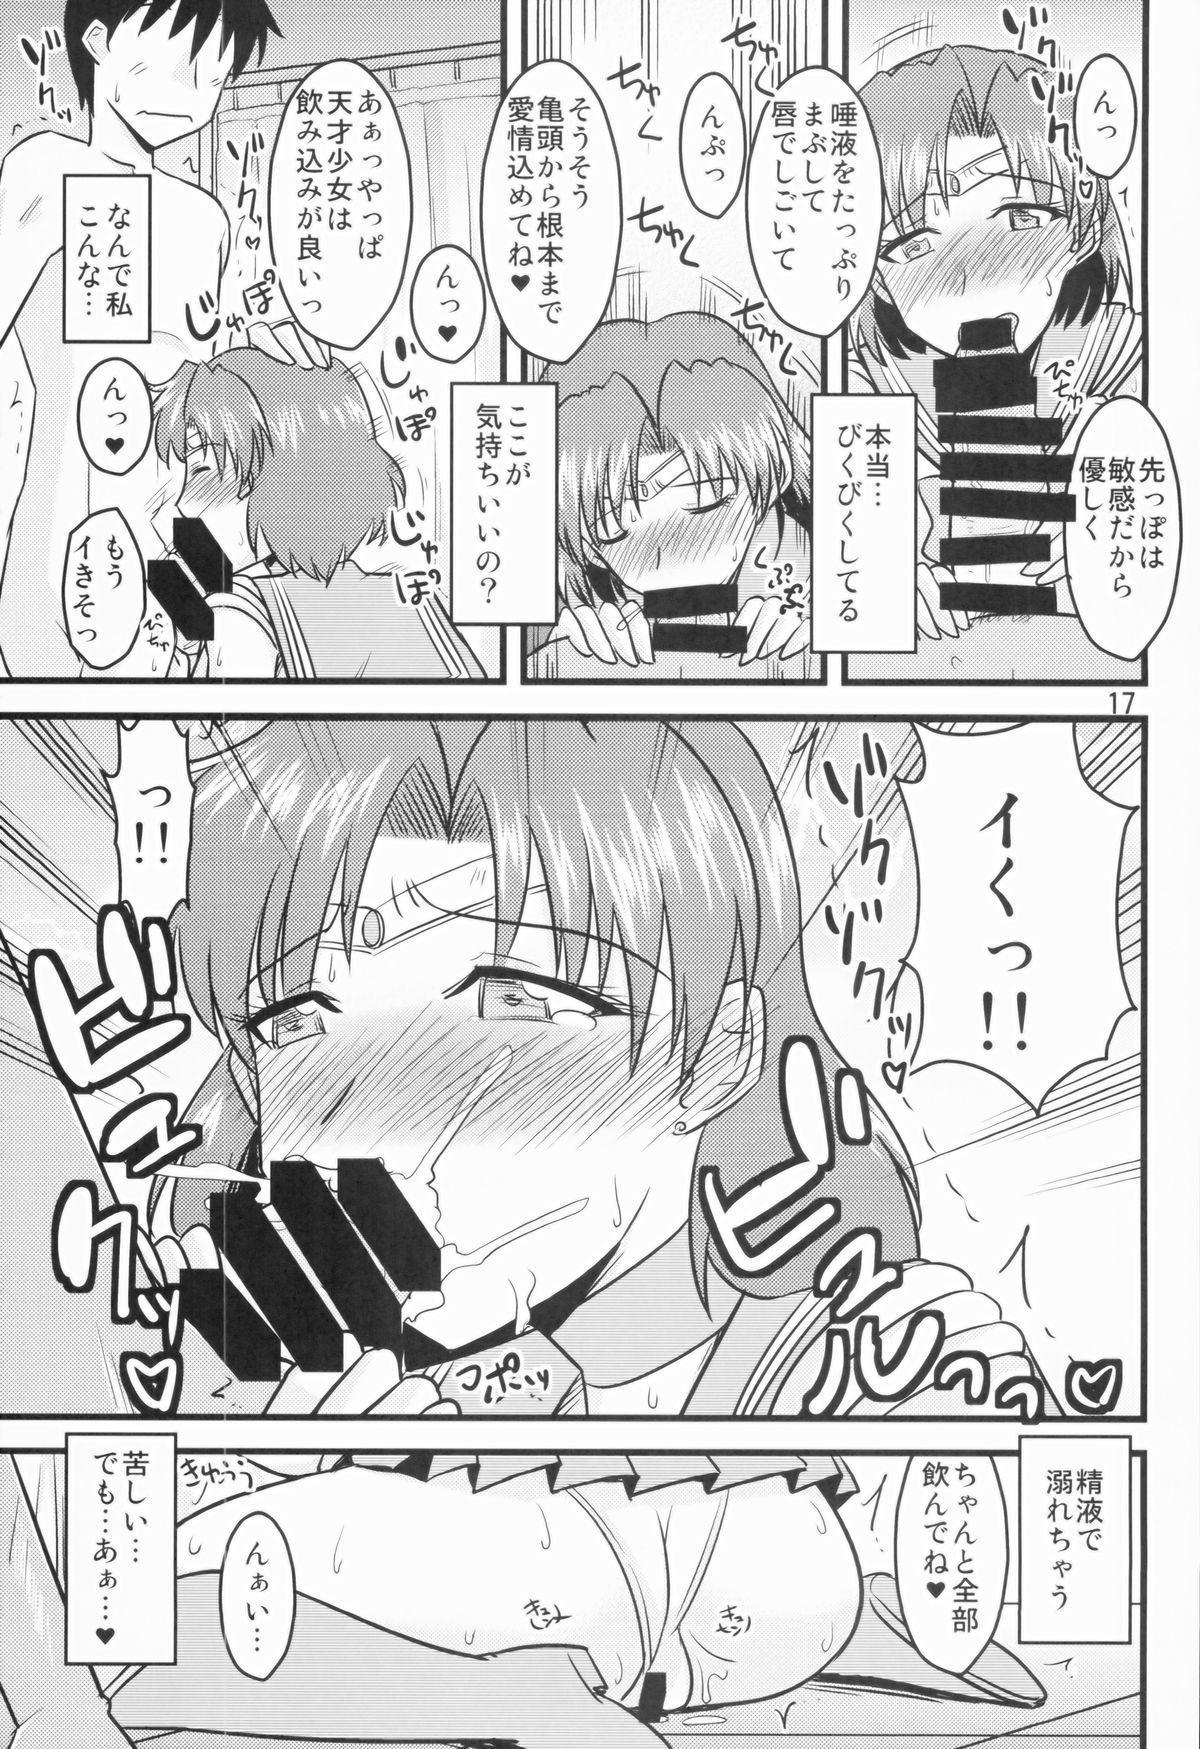 Suimoku no Musume 16